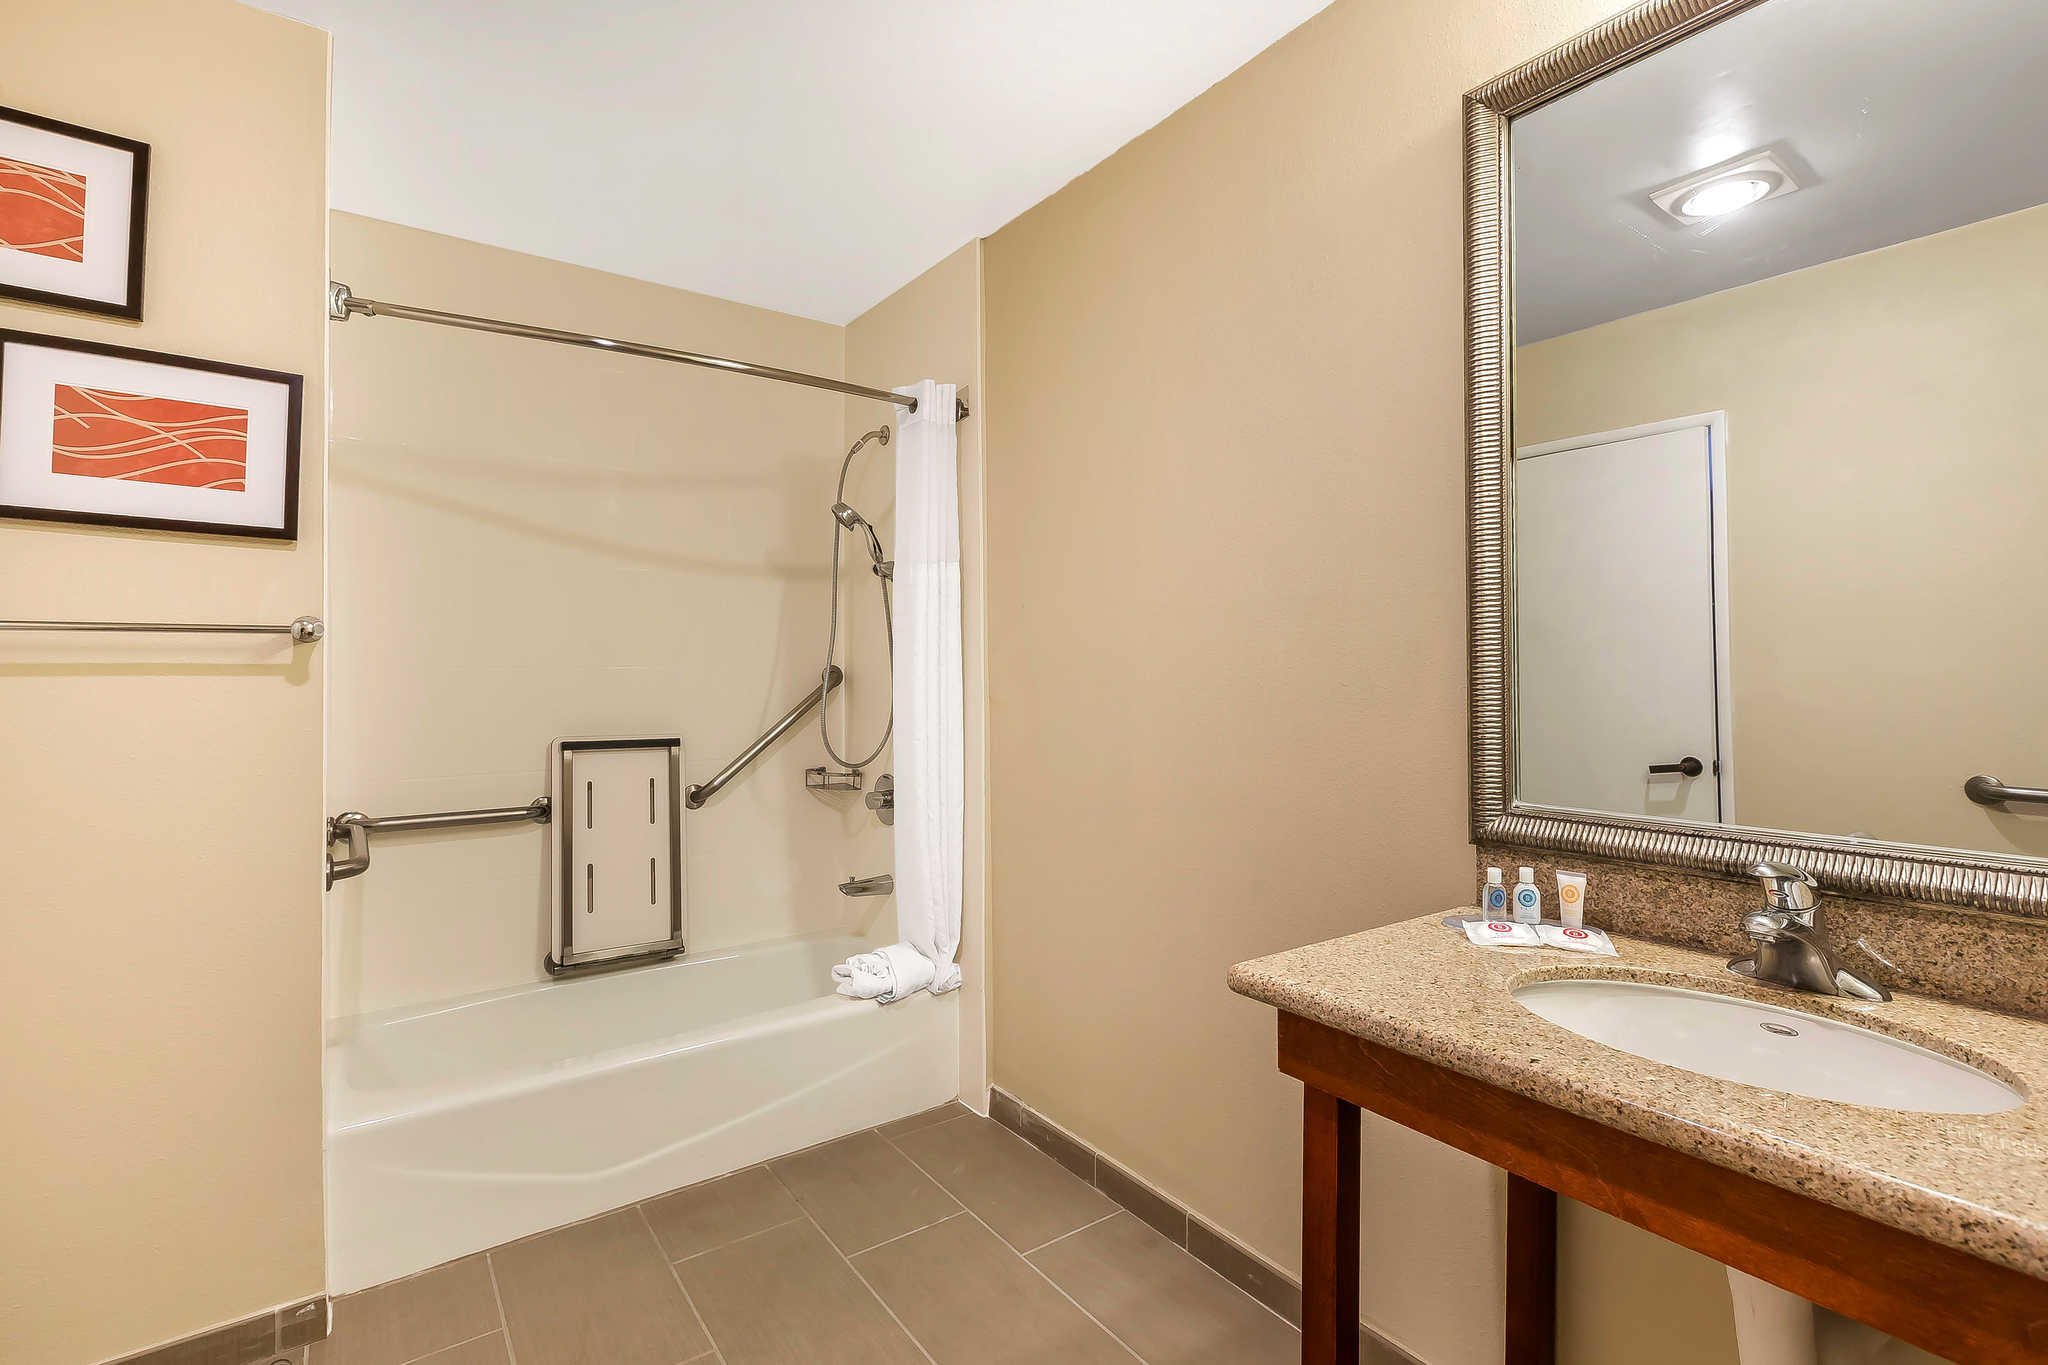 Comfort Inn Santa Monica - West Los Angeles image 12